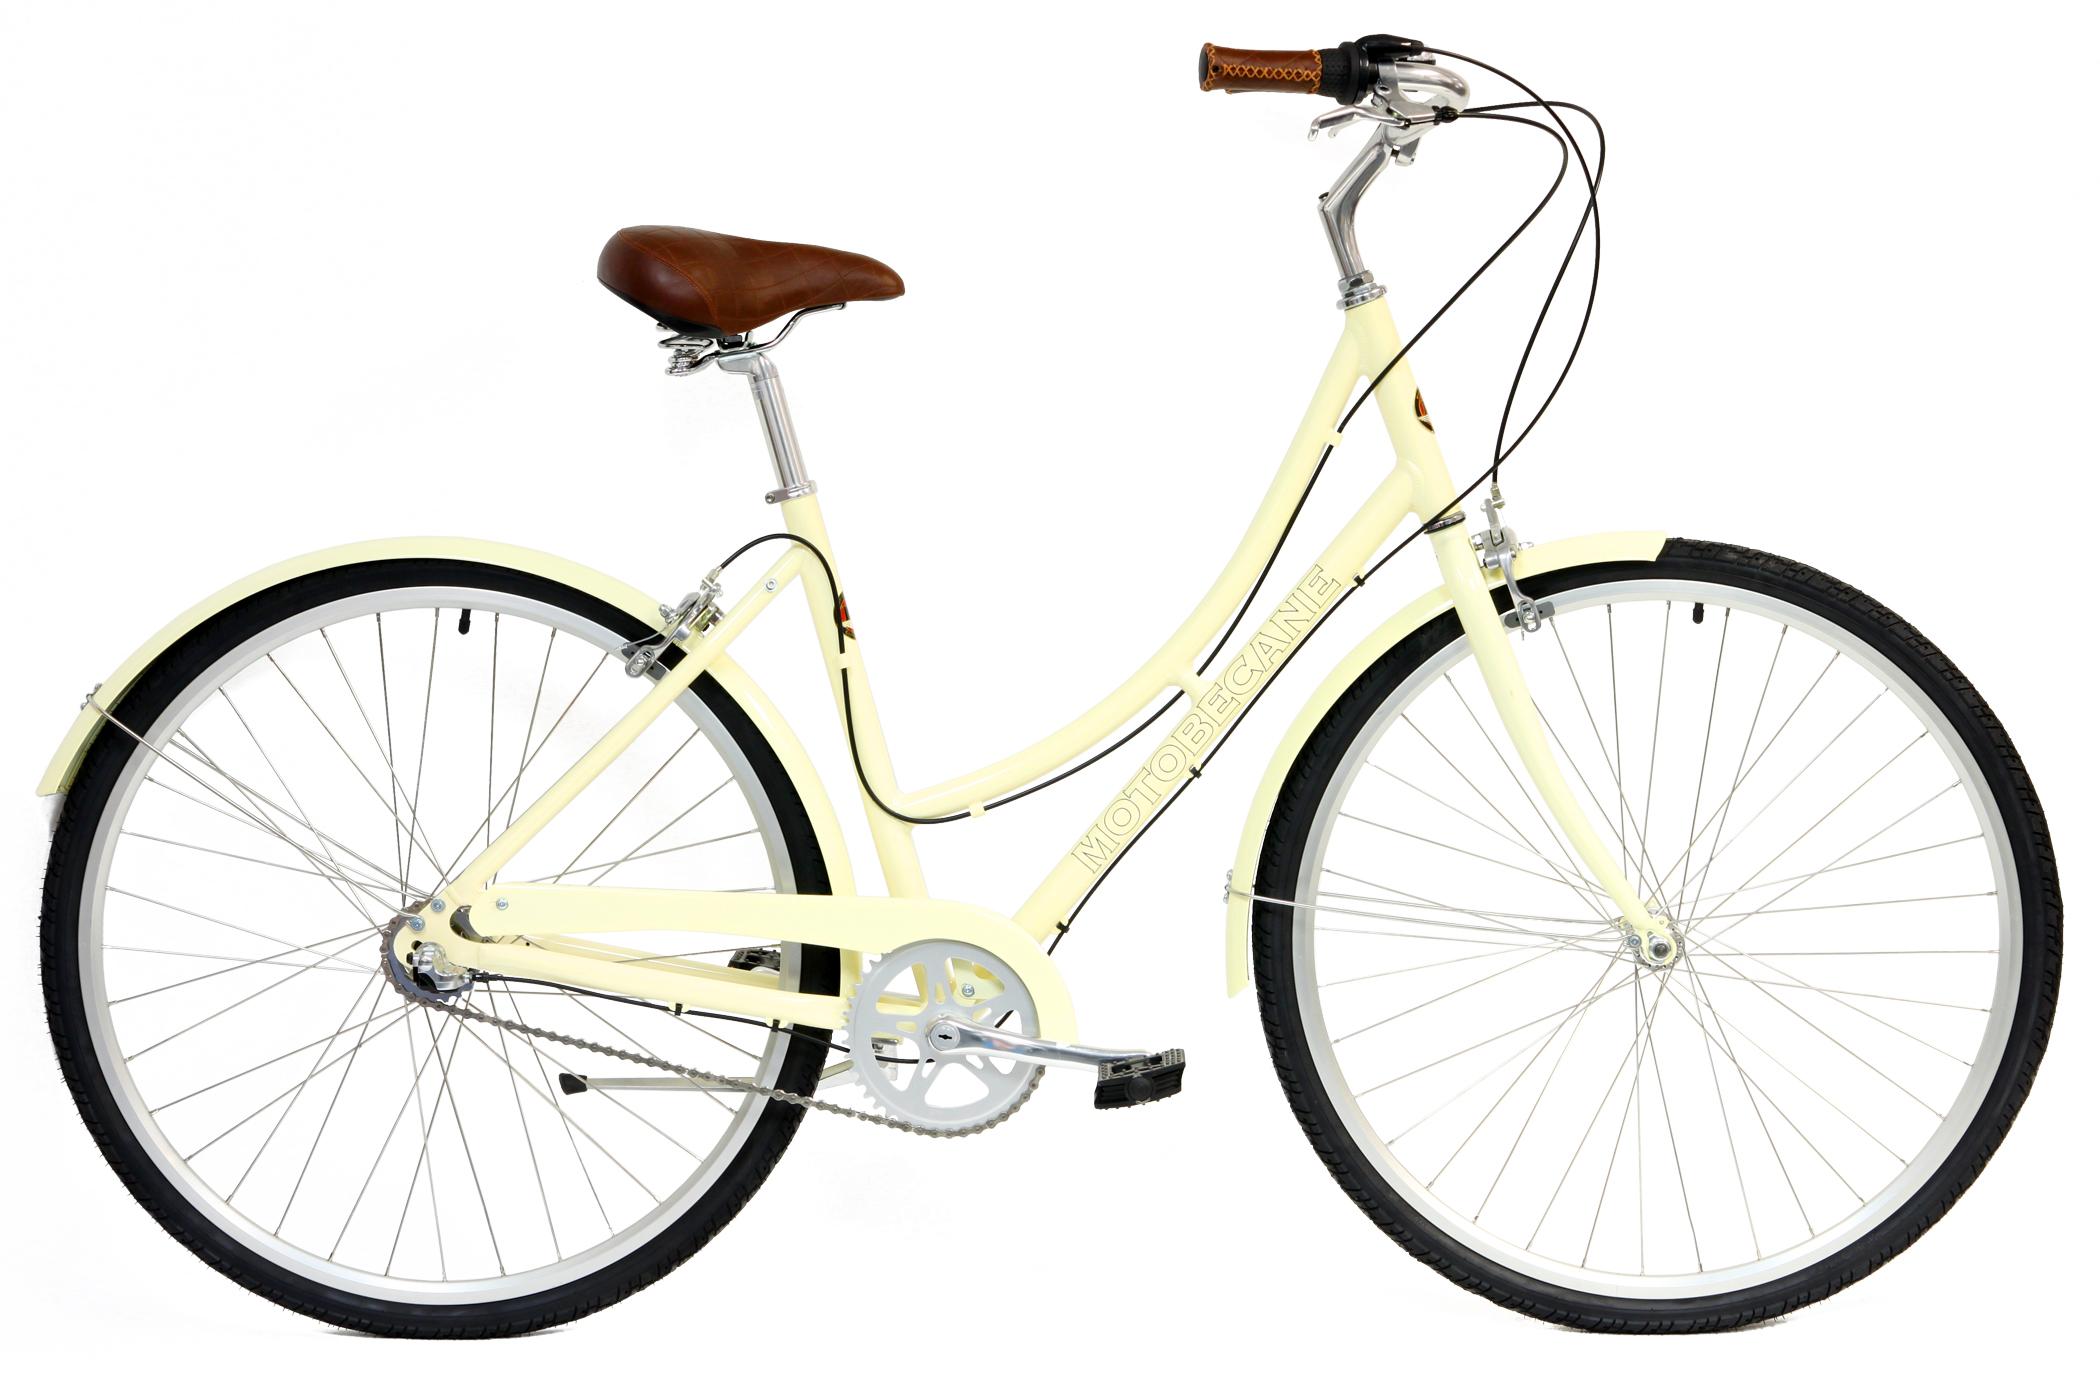 City Bikes Save up to 60% off new Motobecane Bistro Aluminum City ...